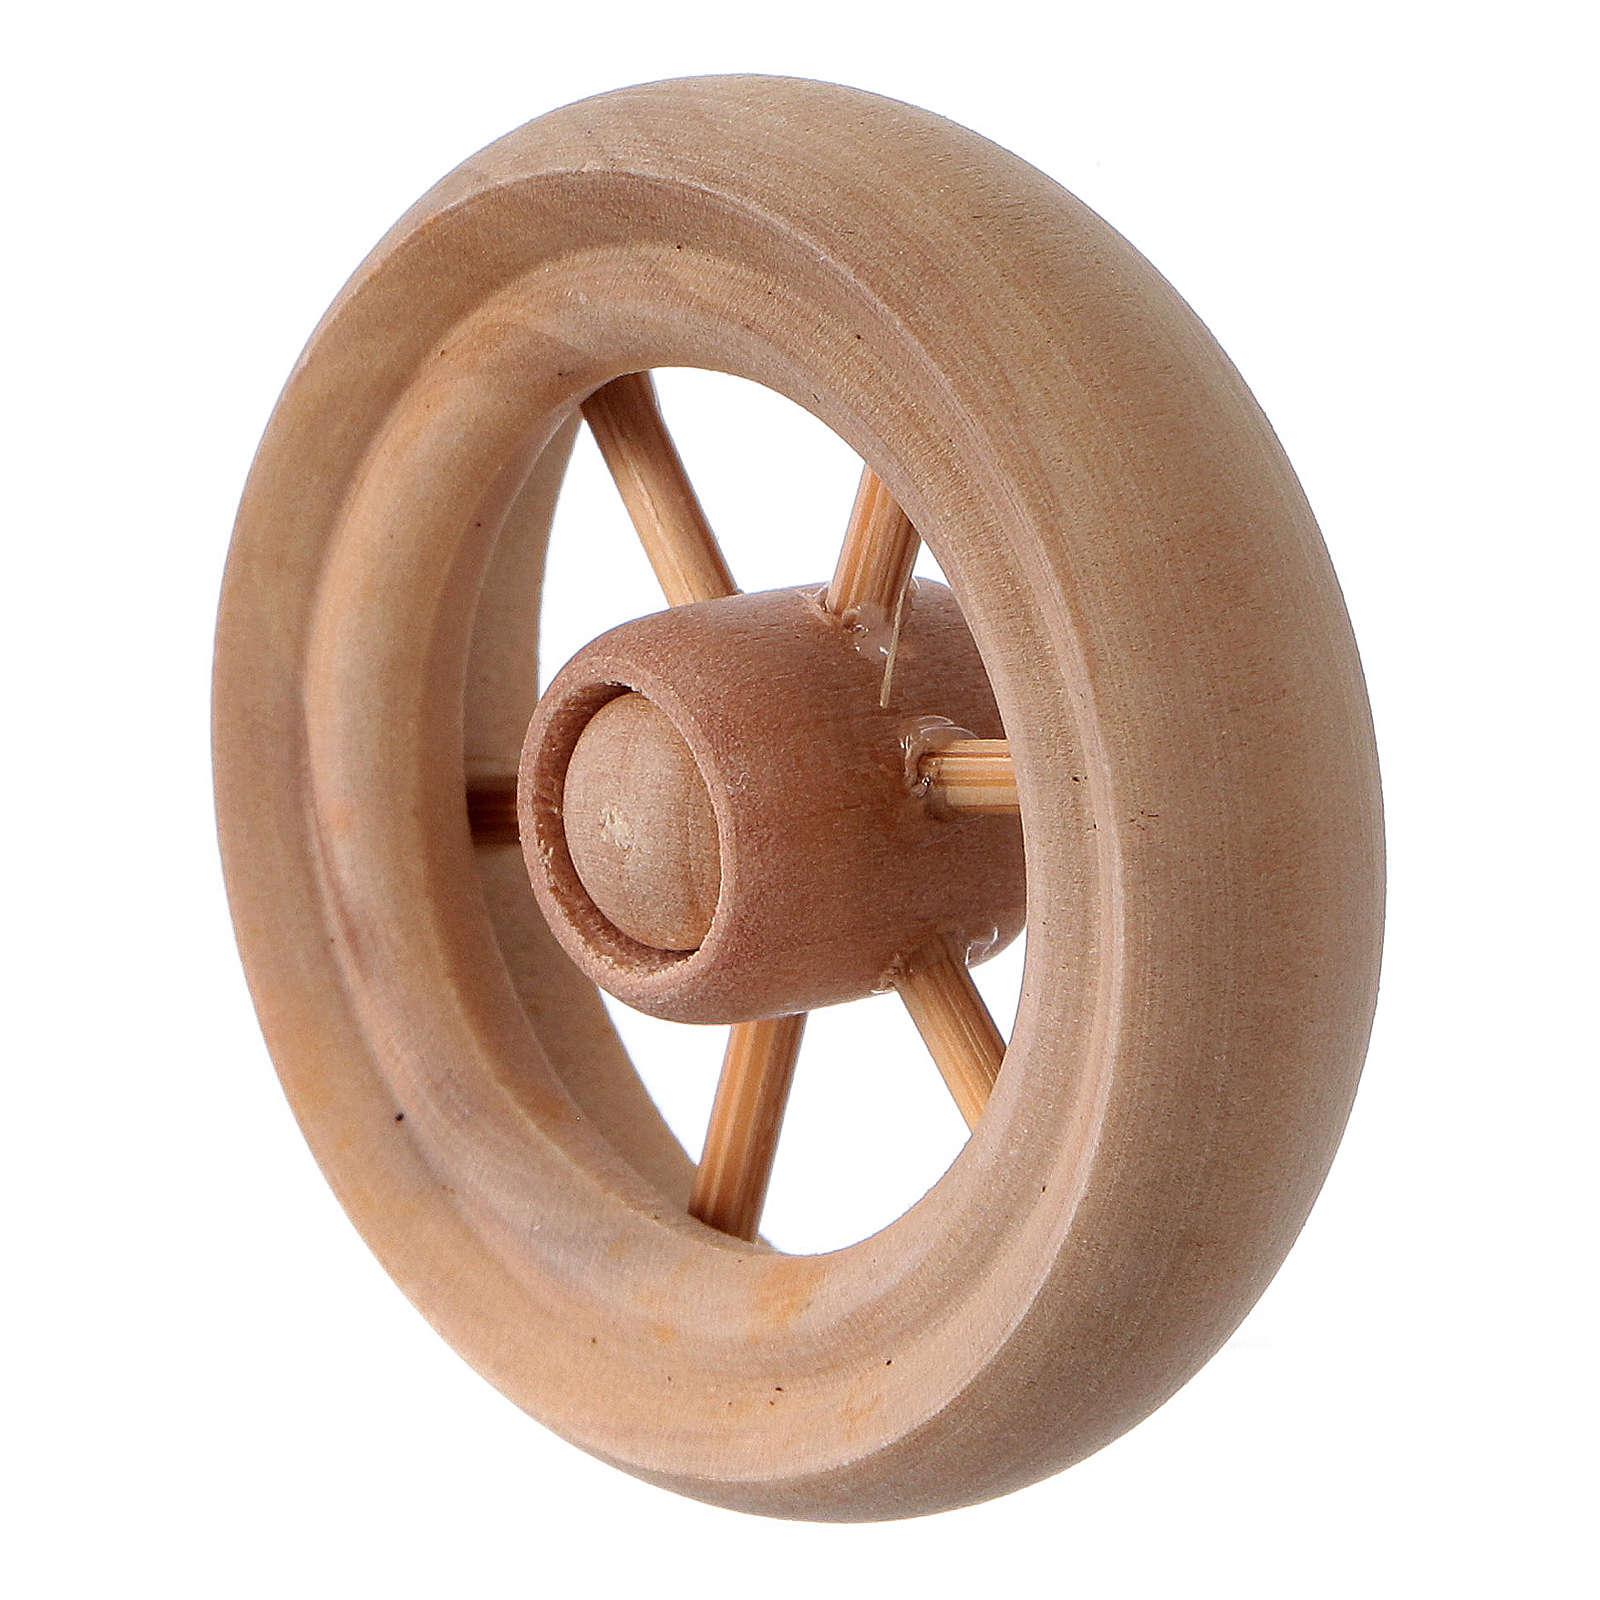 Carriage wheel for Nativity scene in light wood diam. 3.8 cm 4